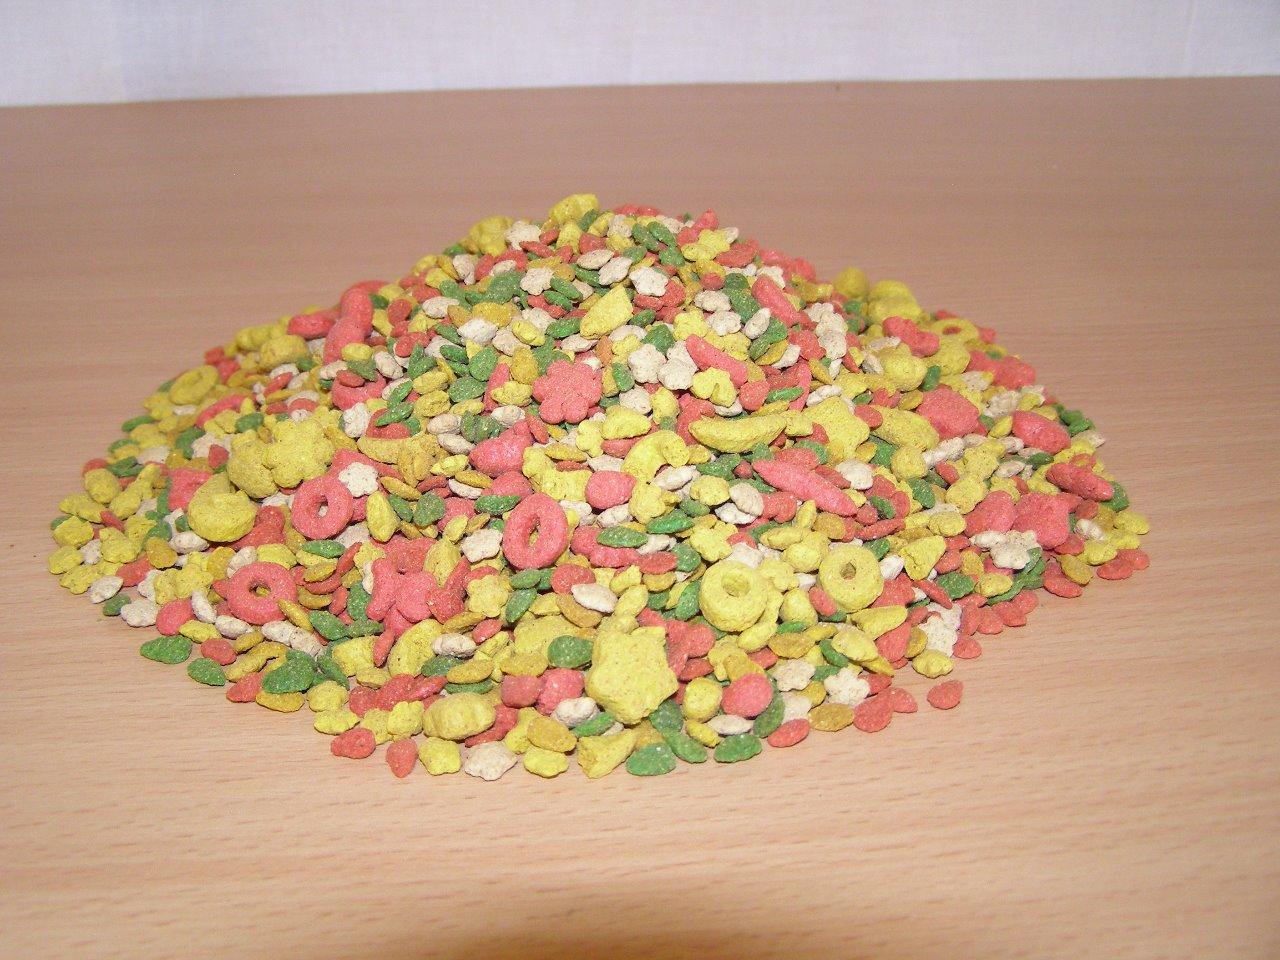 Kaytee Products Granule Exact Rainbow Parrot s DHA 3kg